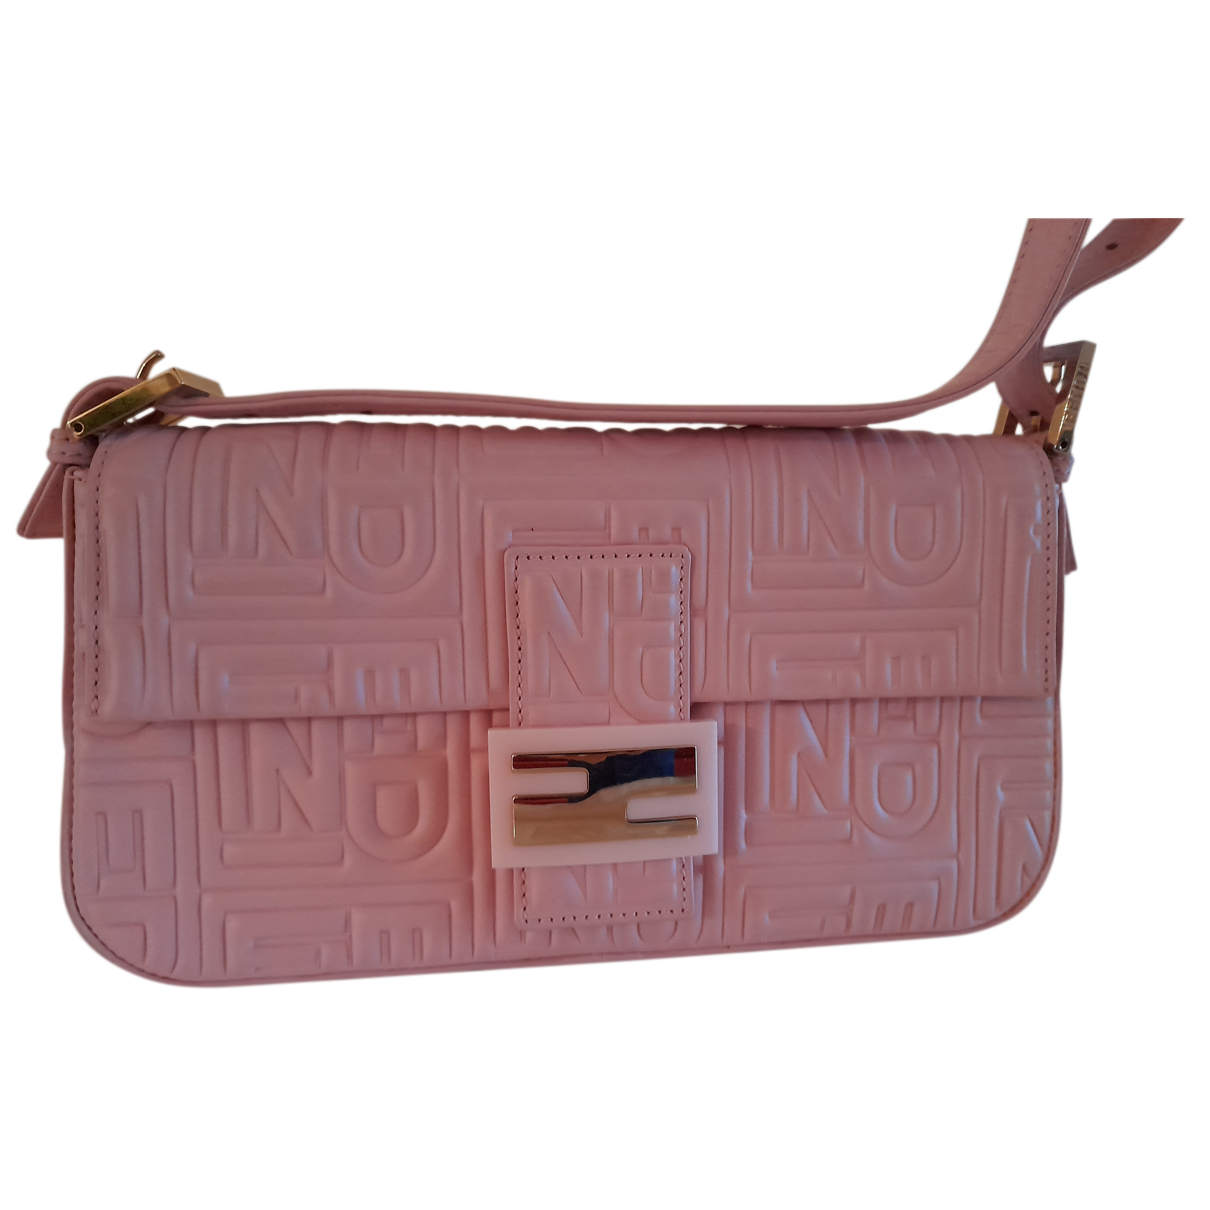 Fendi Baguette Leather Clutch bag for Women N